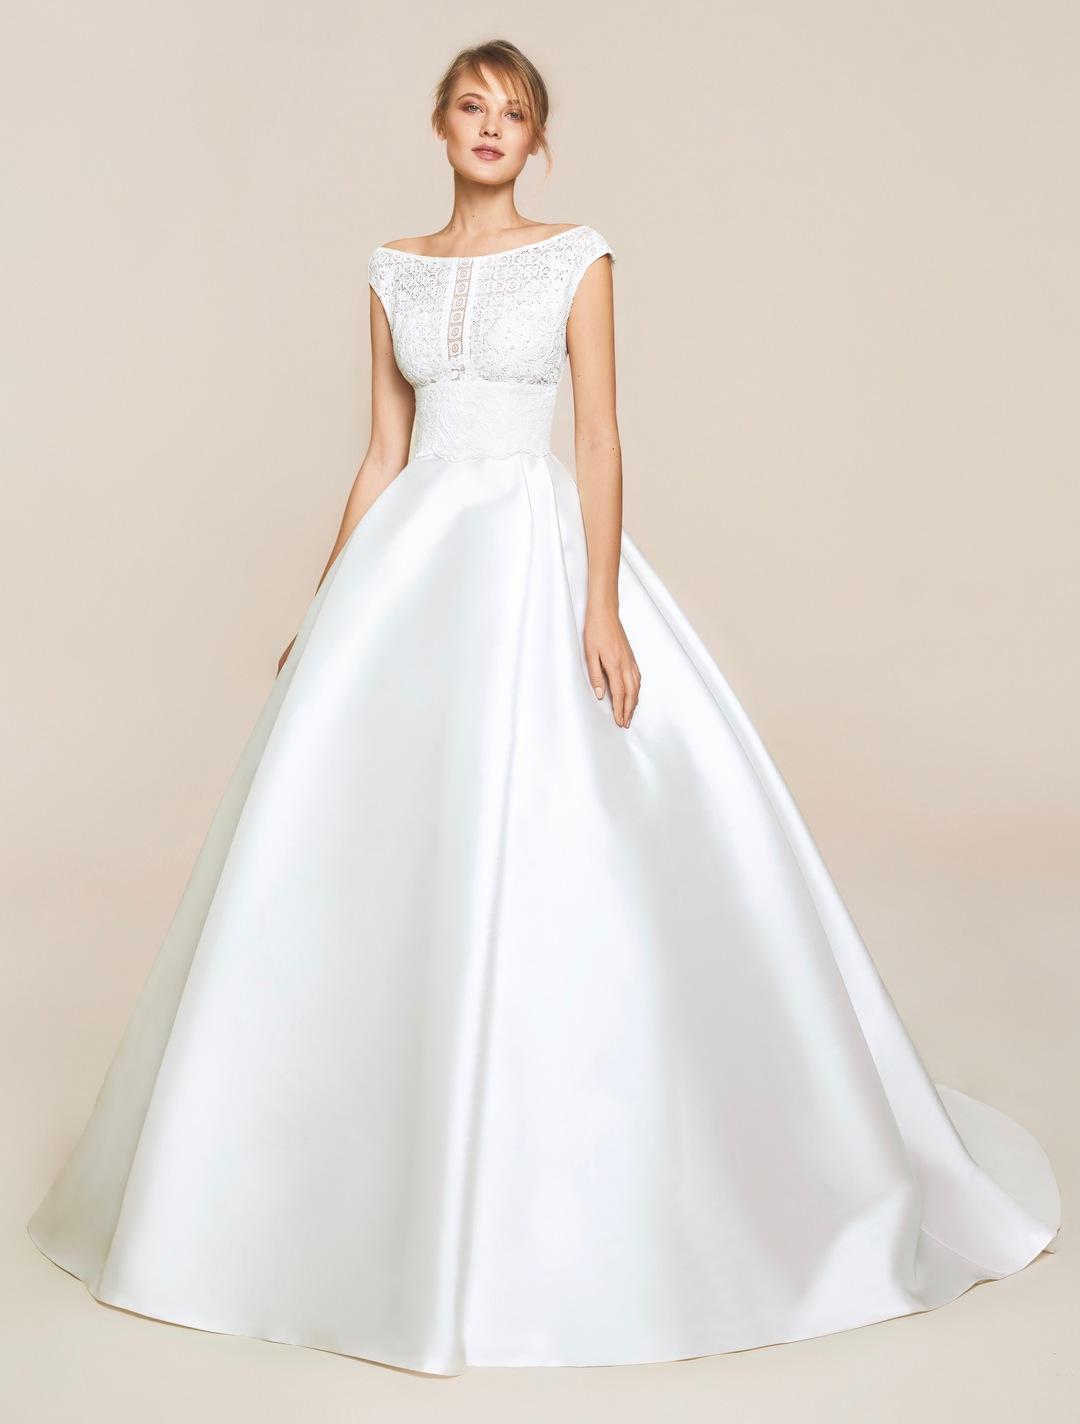 922 dress photo